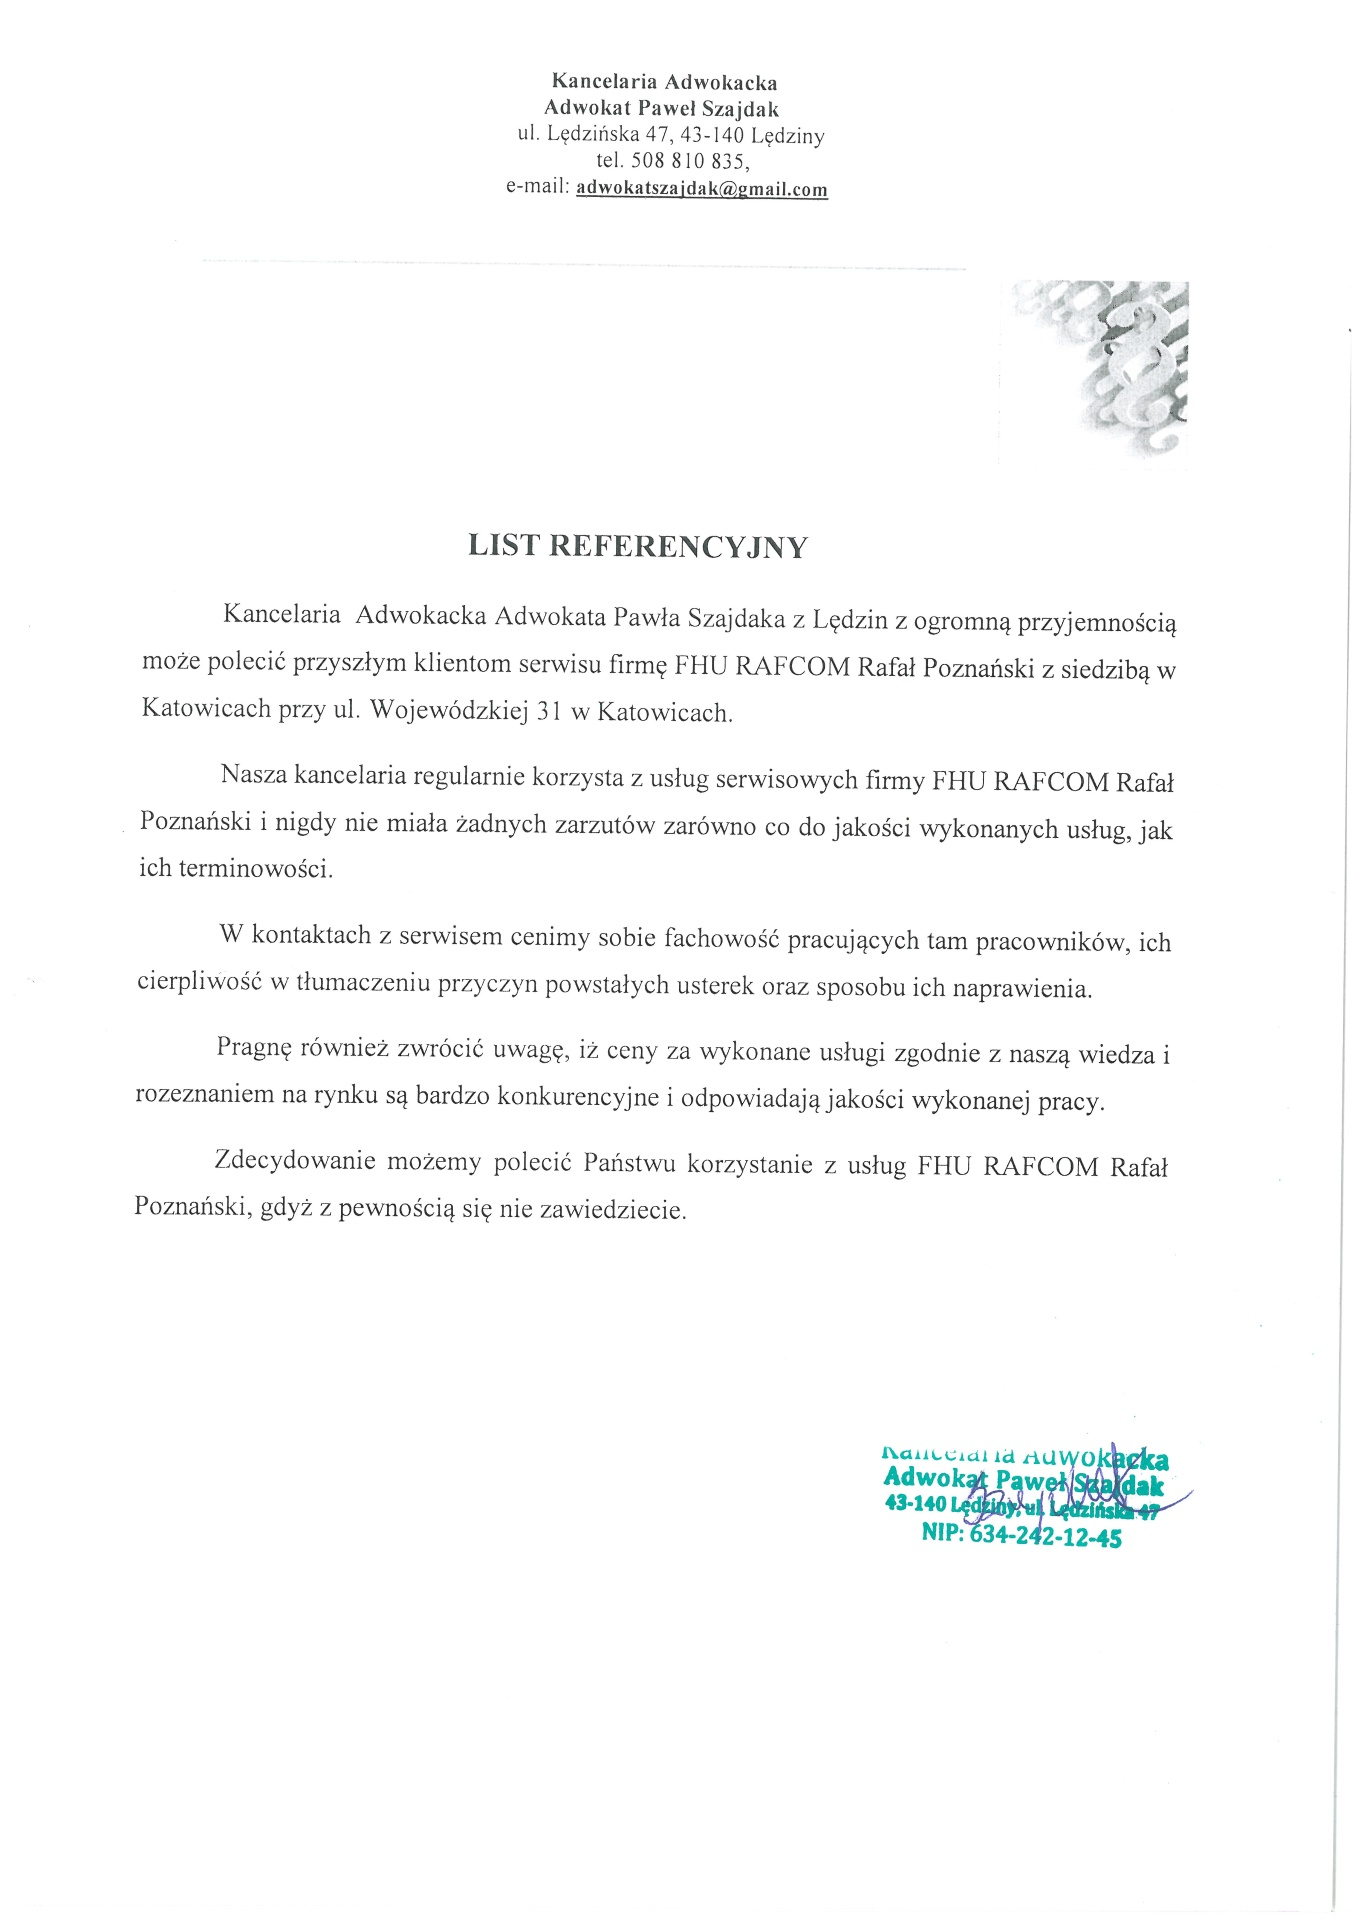 1-Referencje_dla_RAFCOM_Kancelaria-Adwokacka_P_Szajdaka